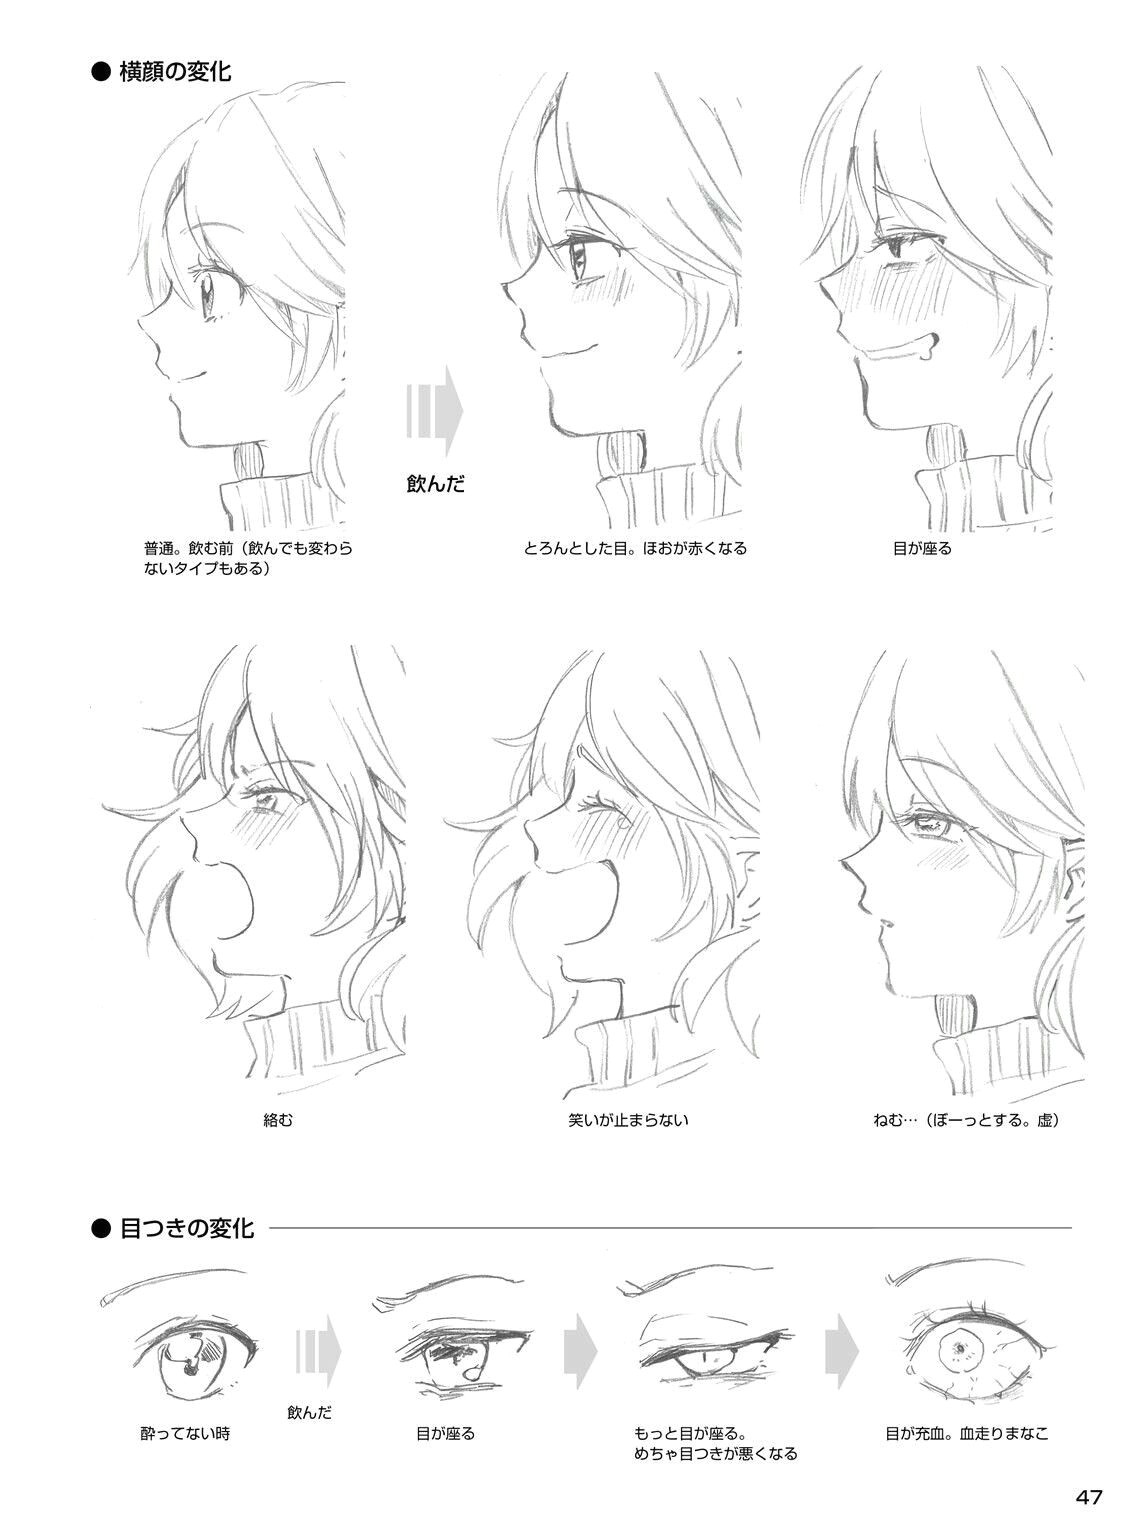 side face eyes expression drunk smiling realistic eye drawing manga drawing drawing tips